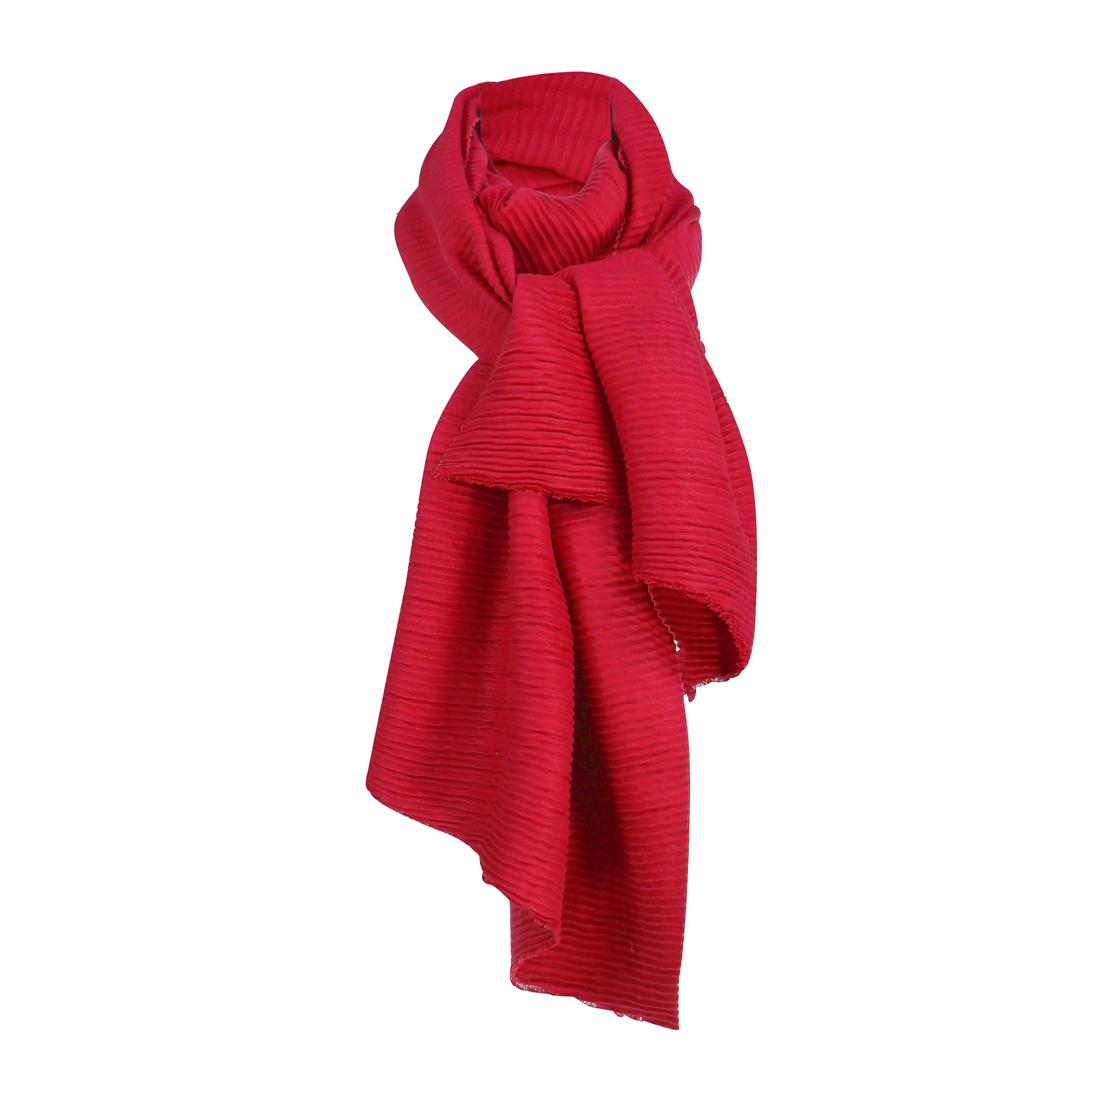 Romano accessoire 54761 in het Rood